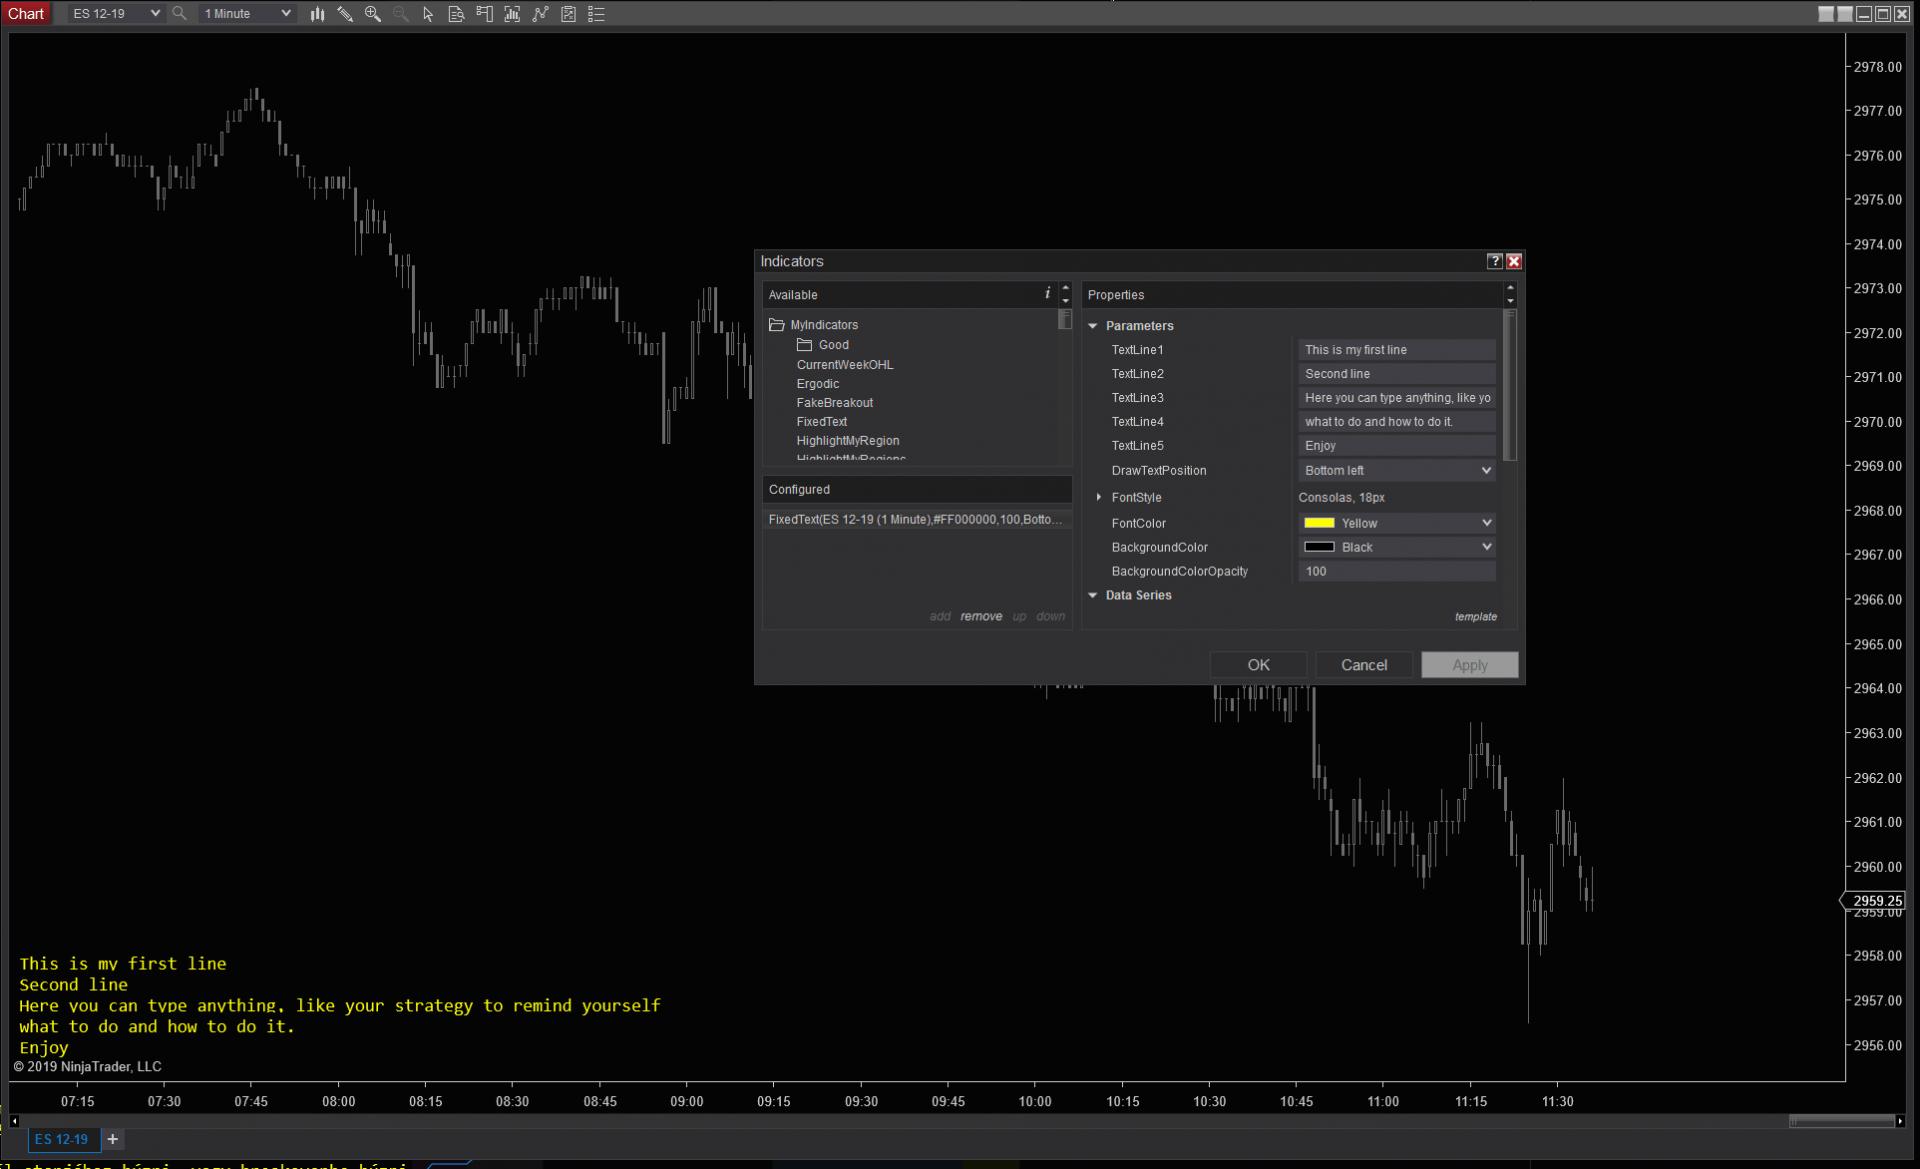 FixedText indicator